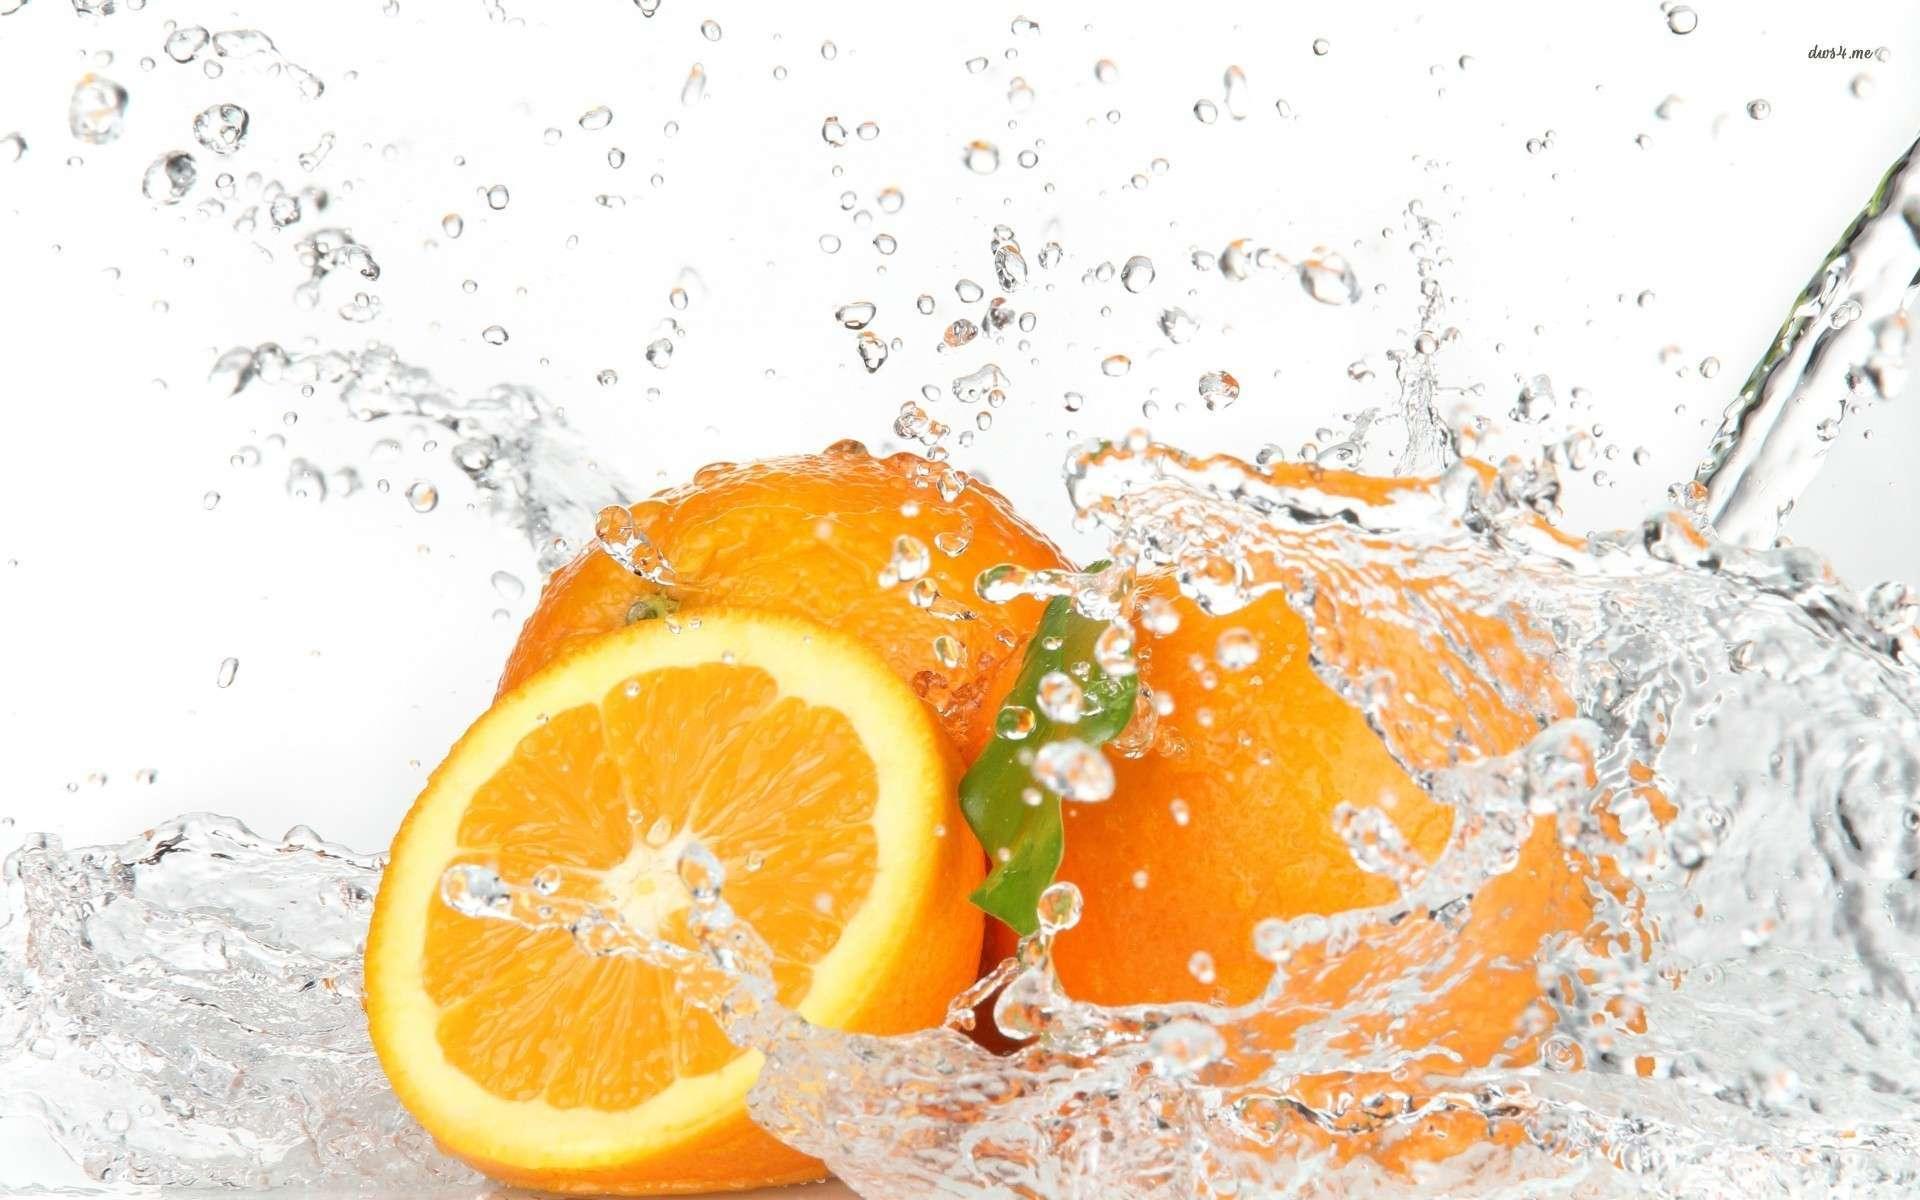 Orange Fruit Wallpaper HD Pictures One